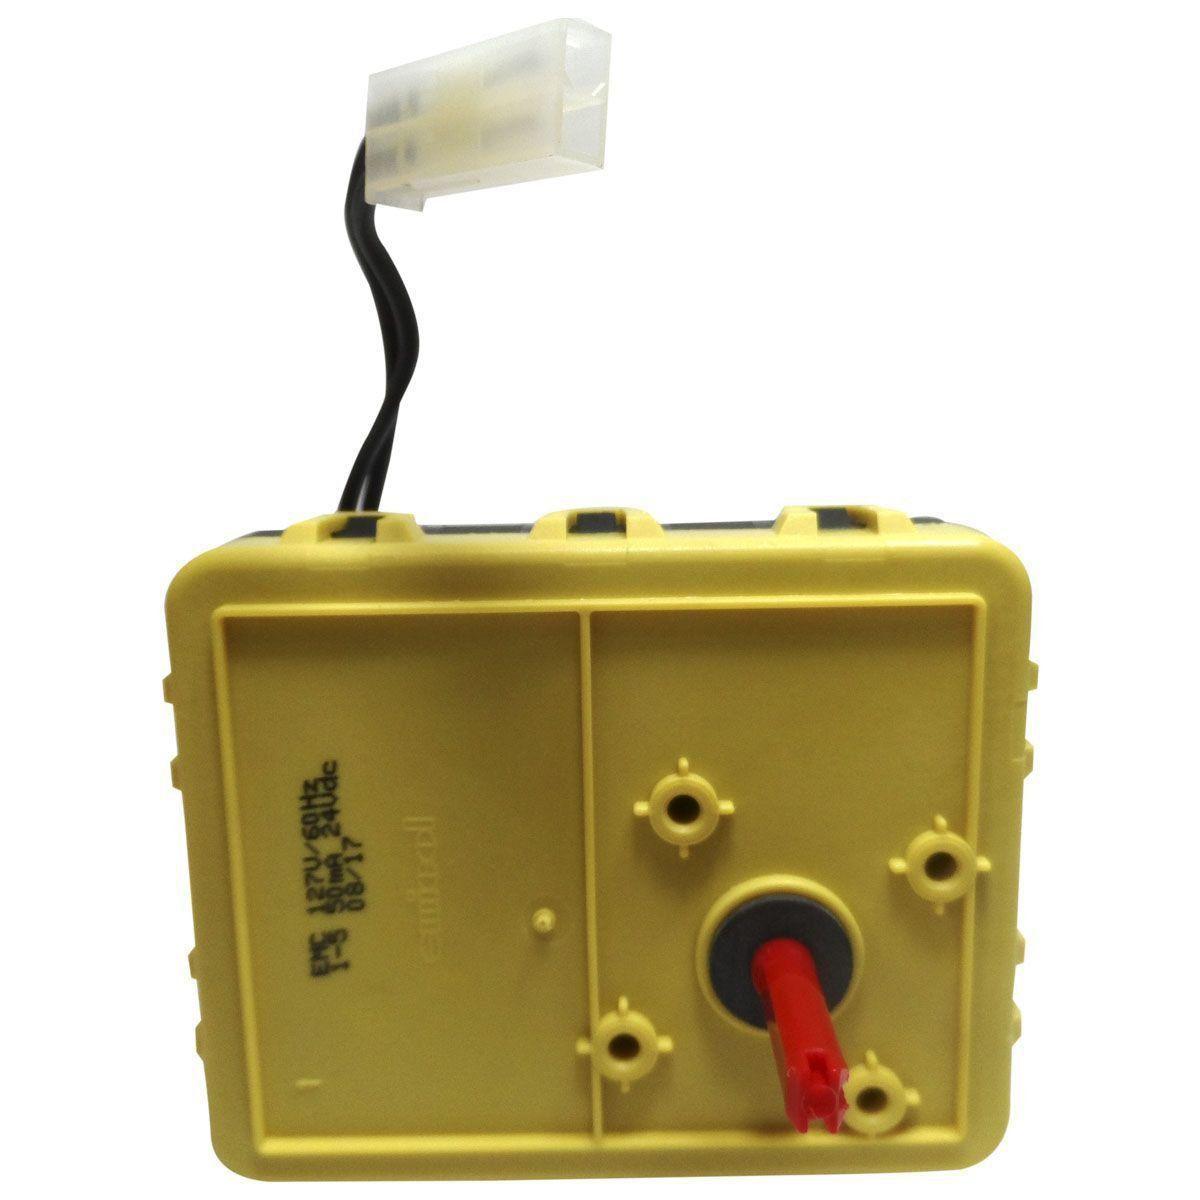 Chave Seletora Lavadora Electrolux 127V   64484601